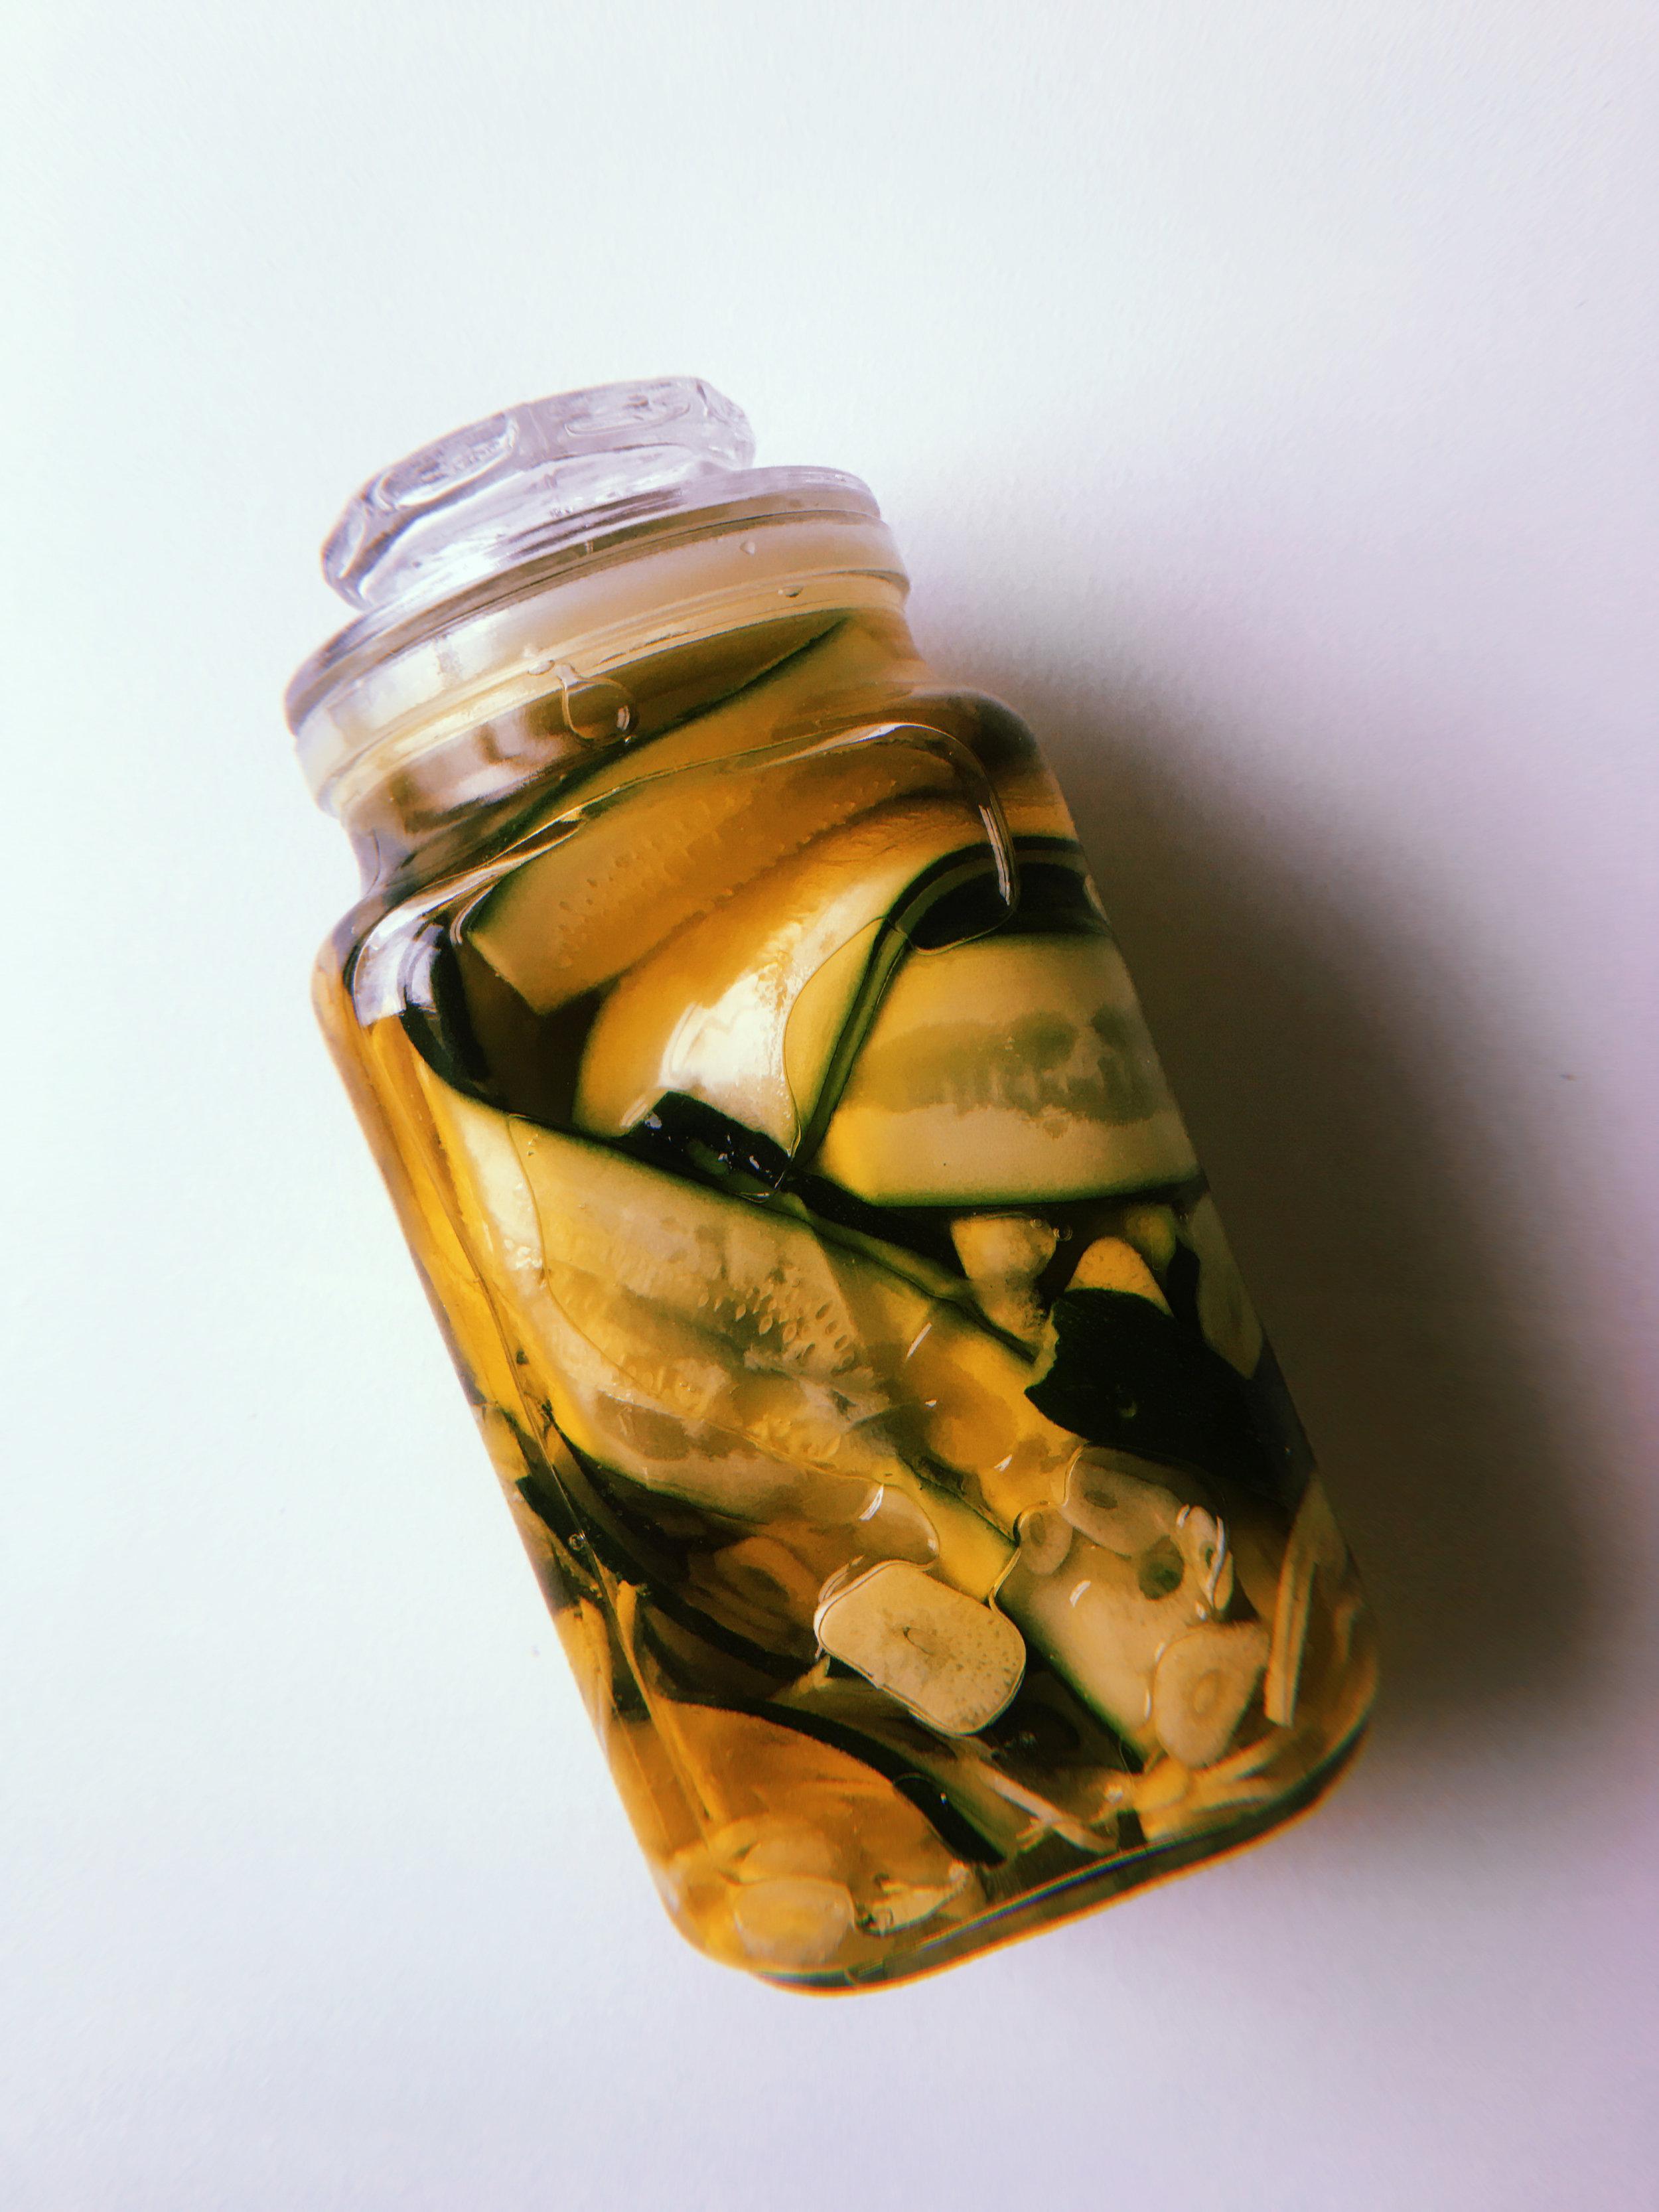 - Aged Zucchini with garlic